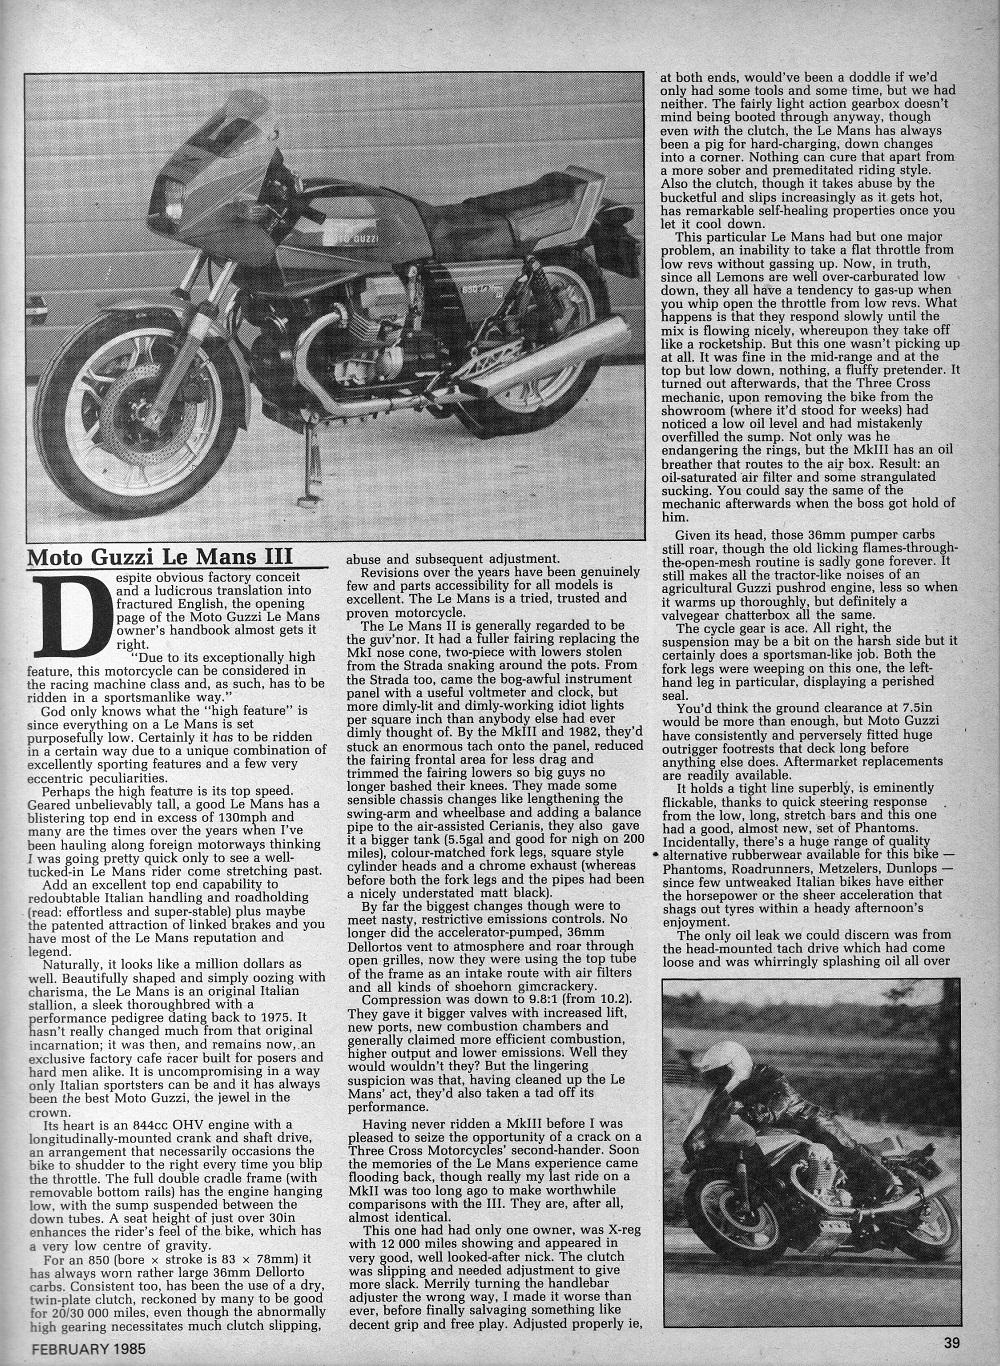 1979 Ducati 900SS & 1981 Moto Guzzi Le Mans 111 road test.5.jpg